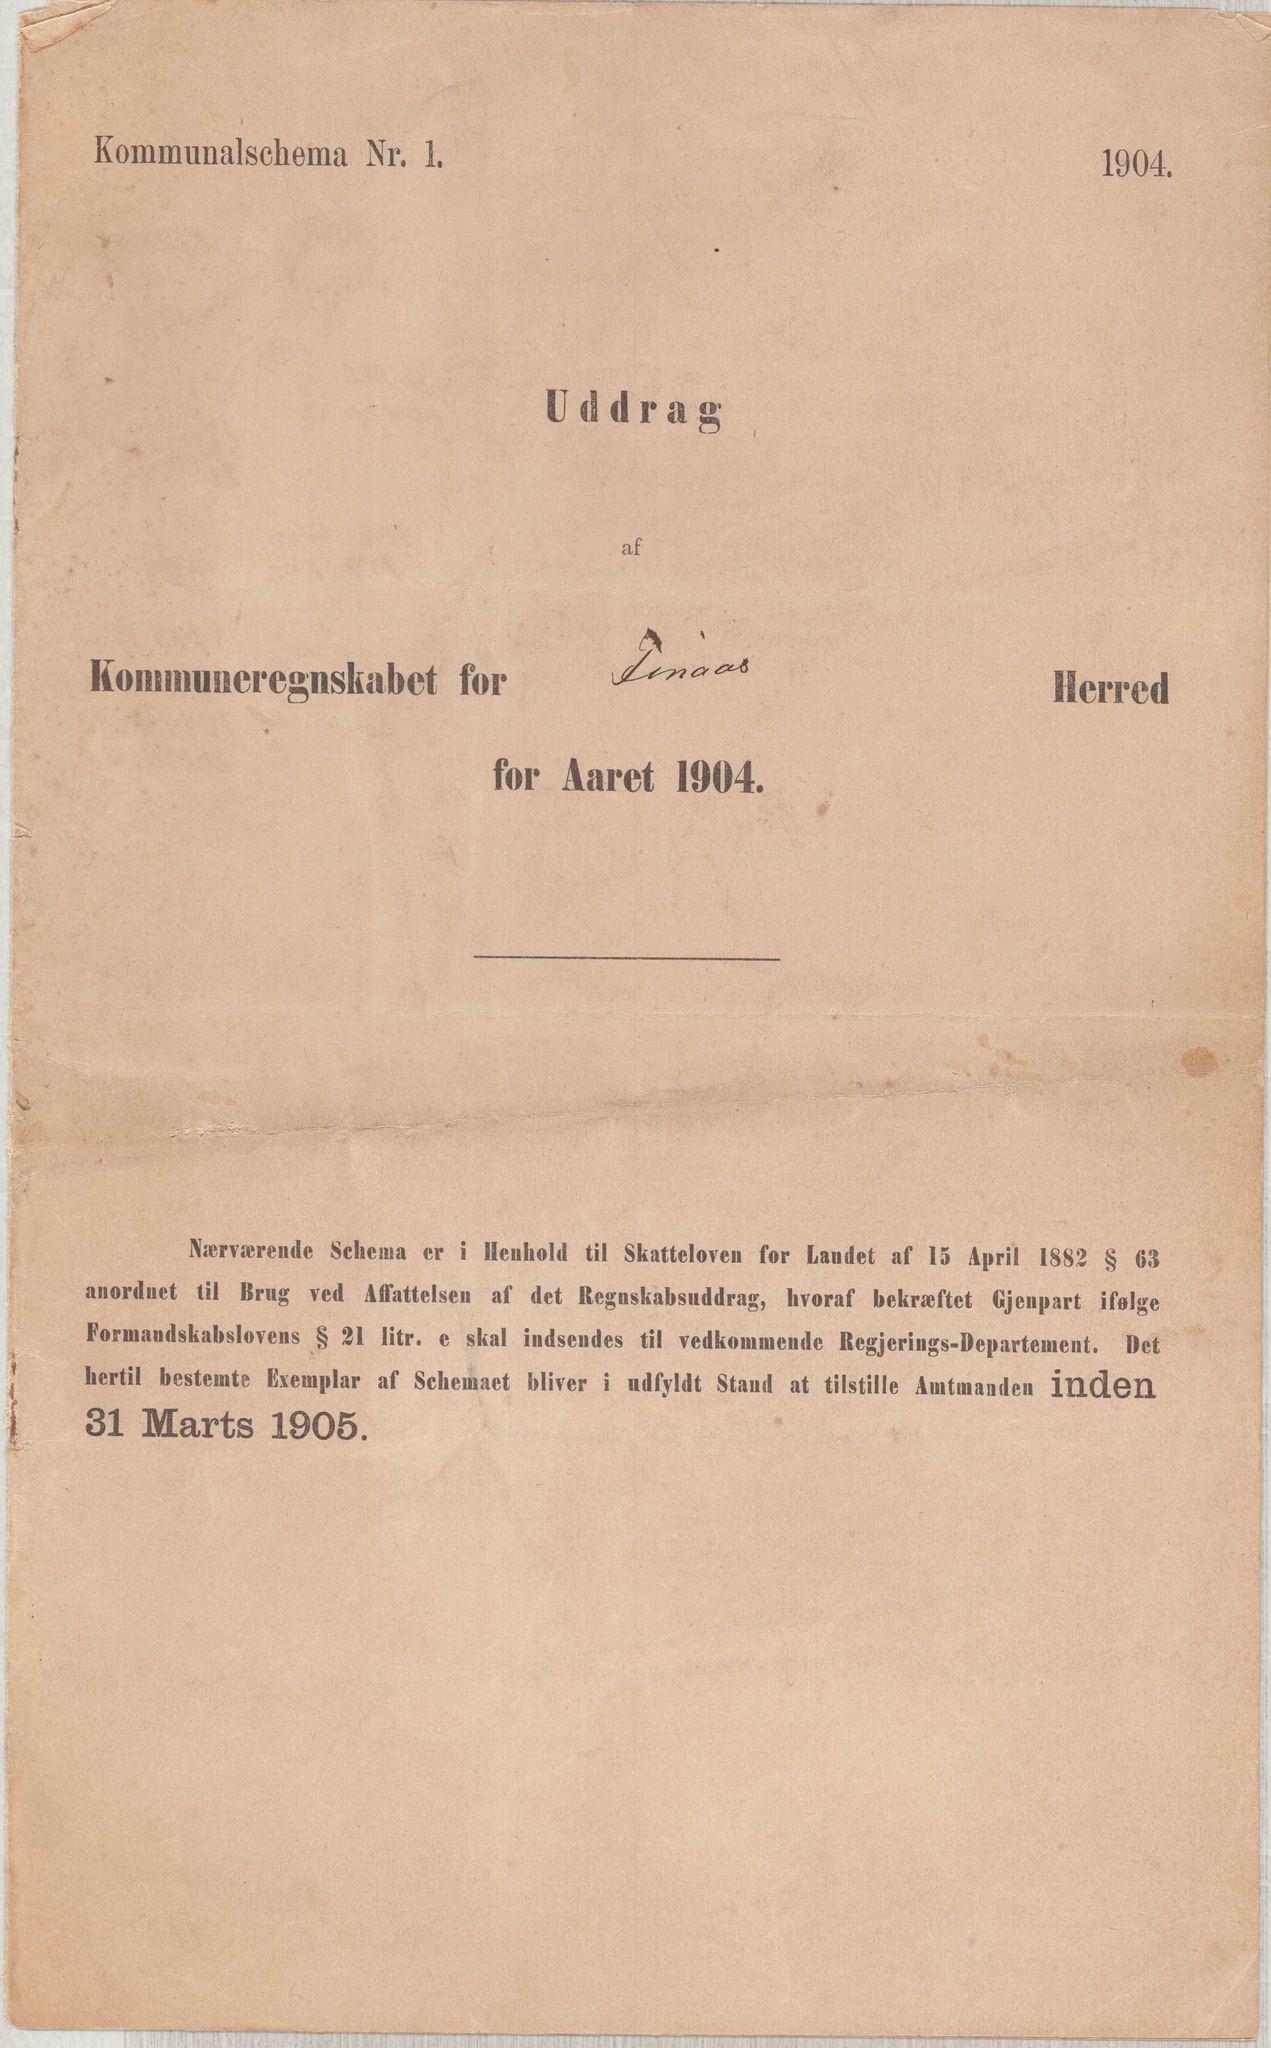 IKAH, Finnaas kommune. Heradskassen, R/Ra/Raa/L0001: Årsrekneskap, 1904-1910, s. 1